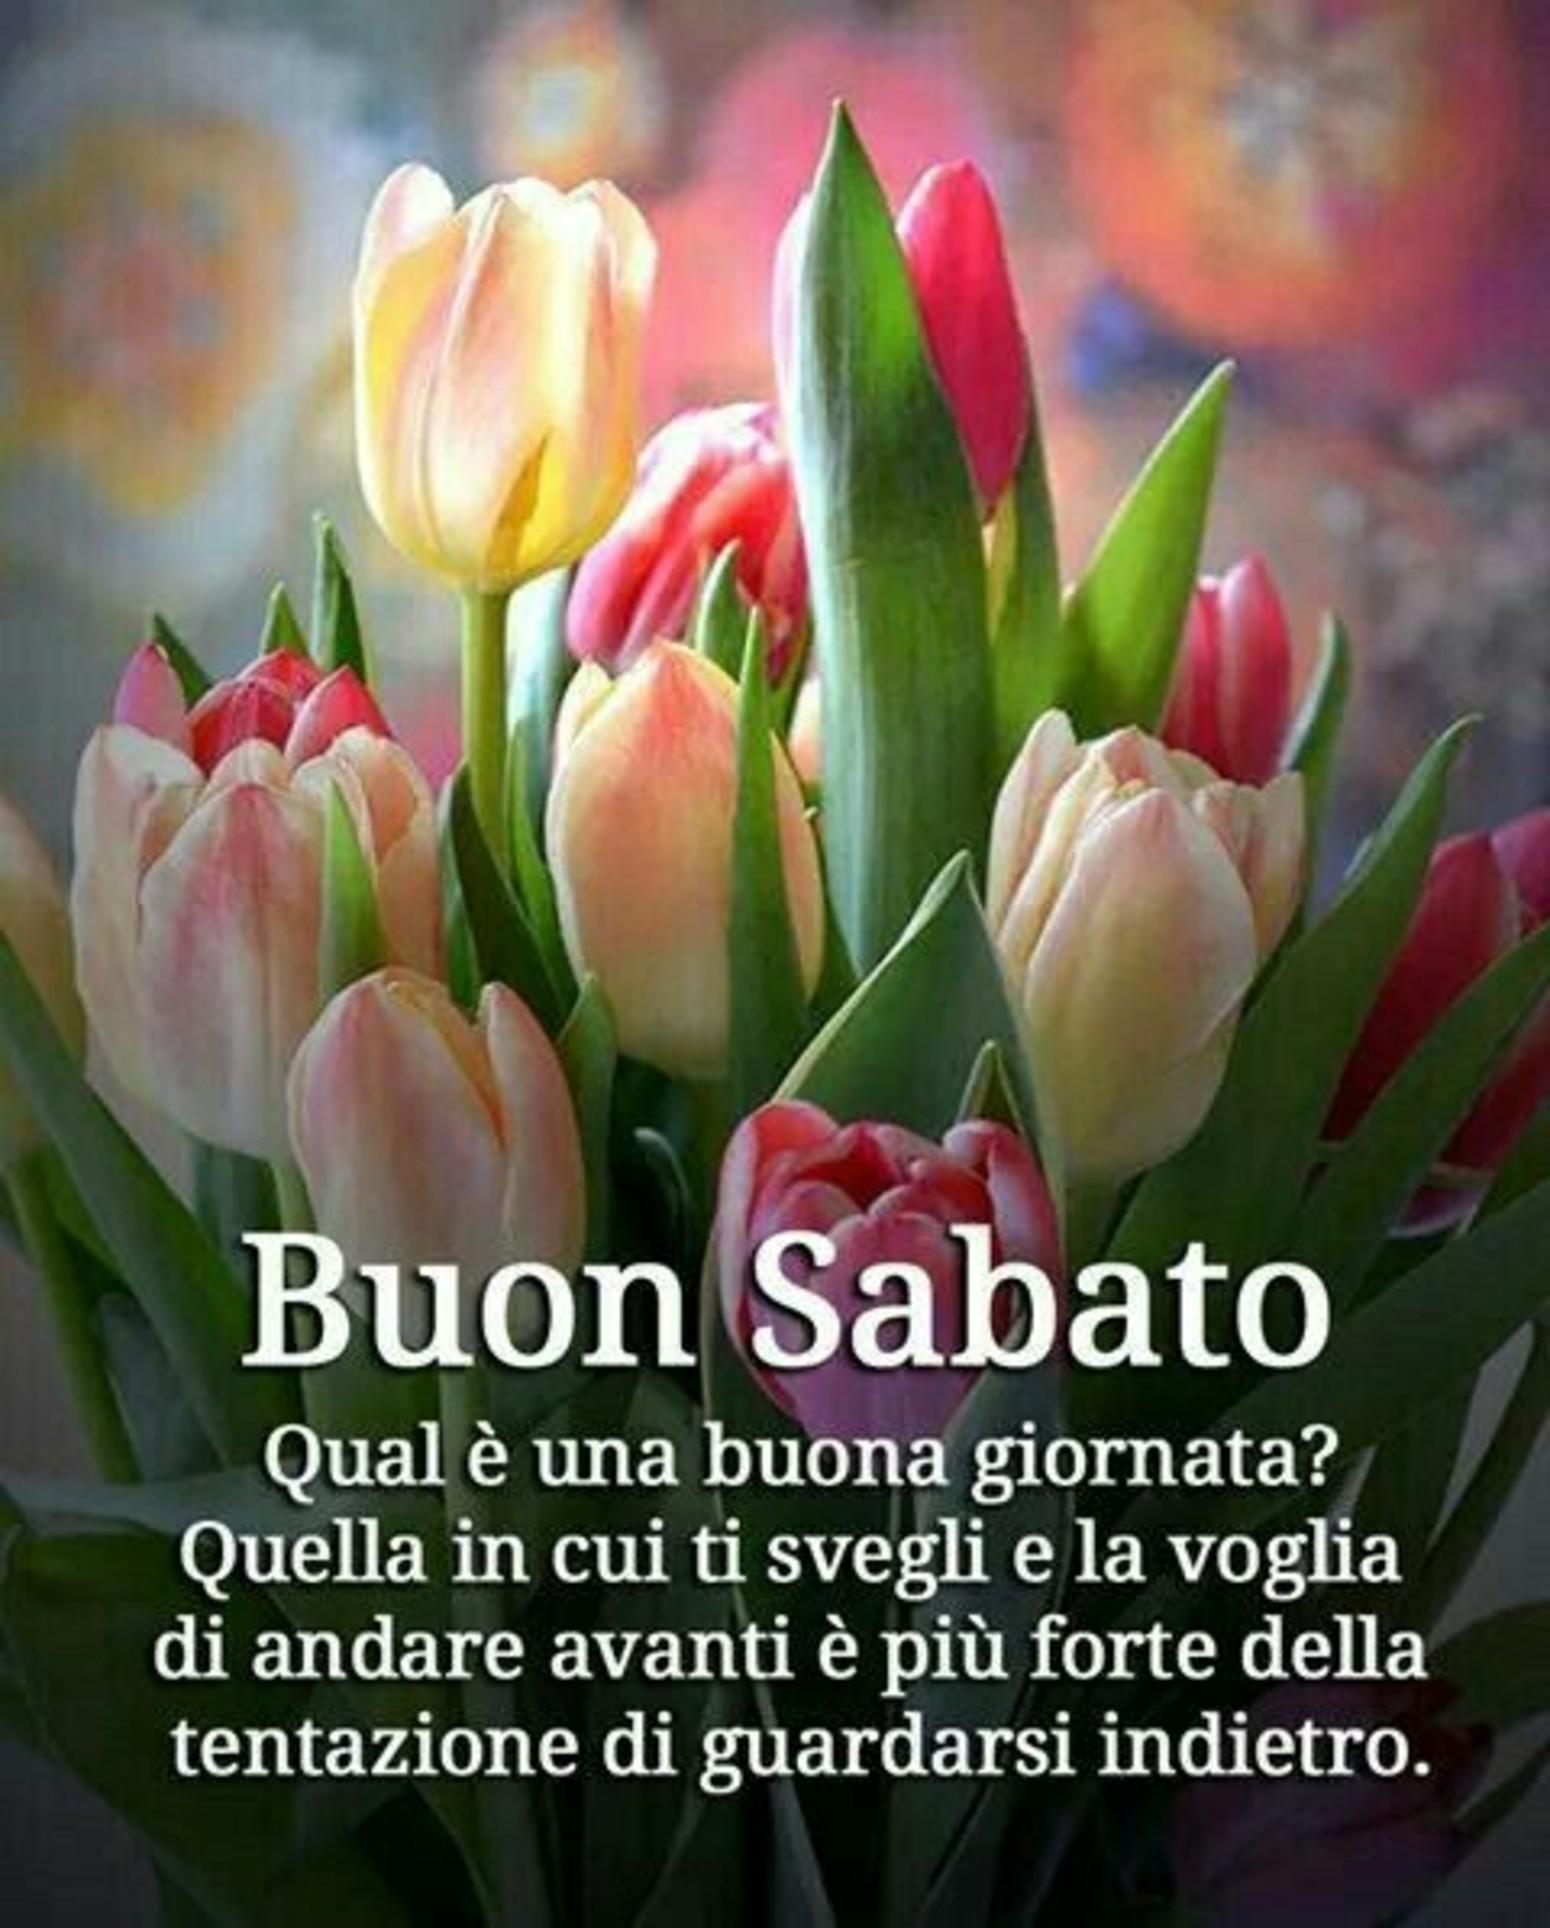 Frasi E Immagini Buon Sabato 8048 Immaginifacebook It